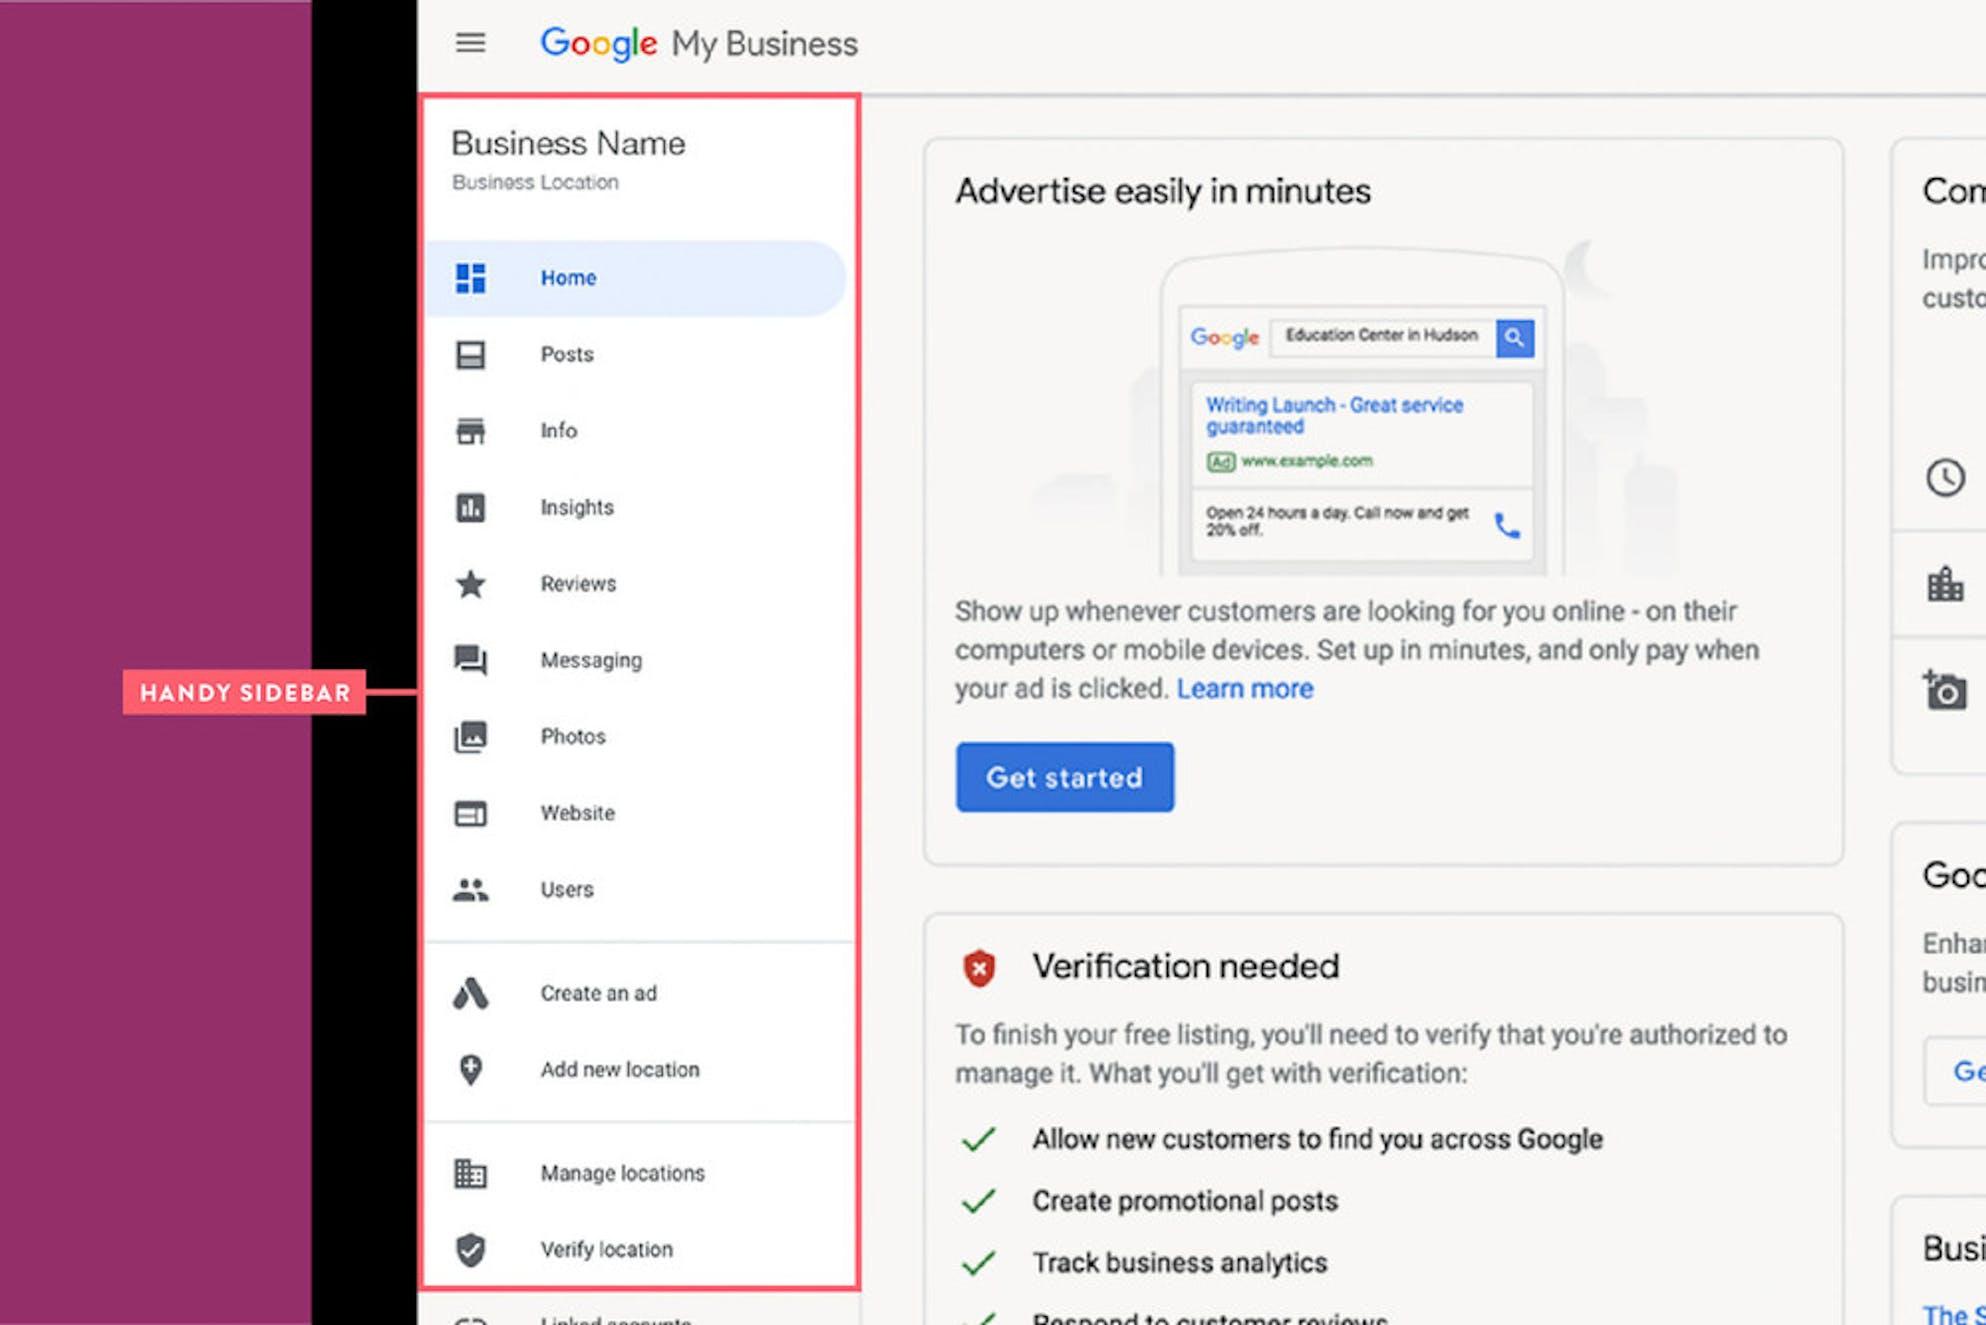 google my business handy sidebar screenshot